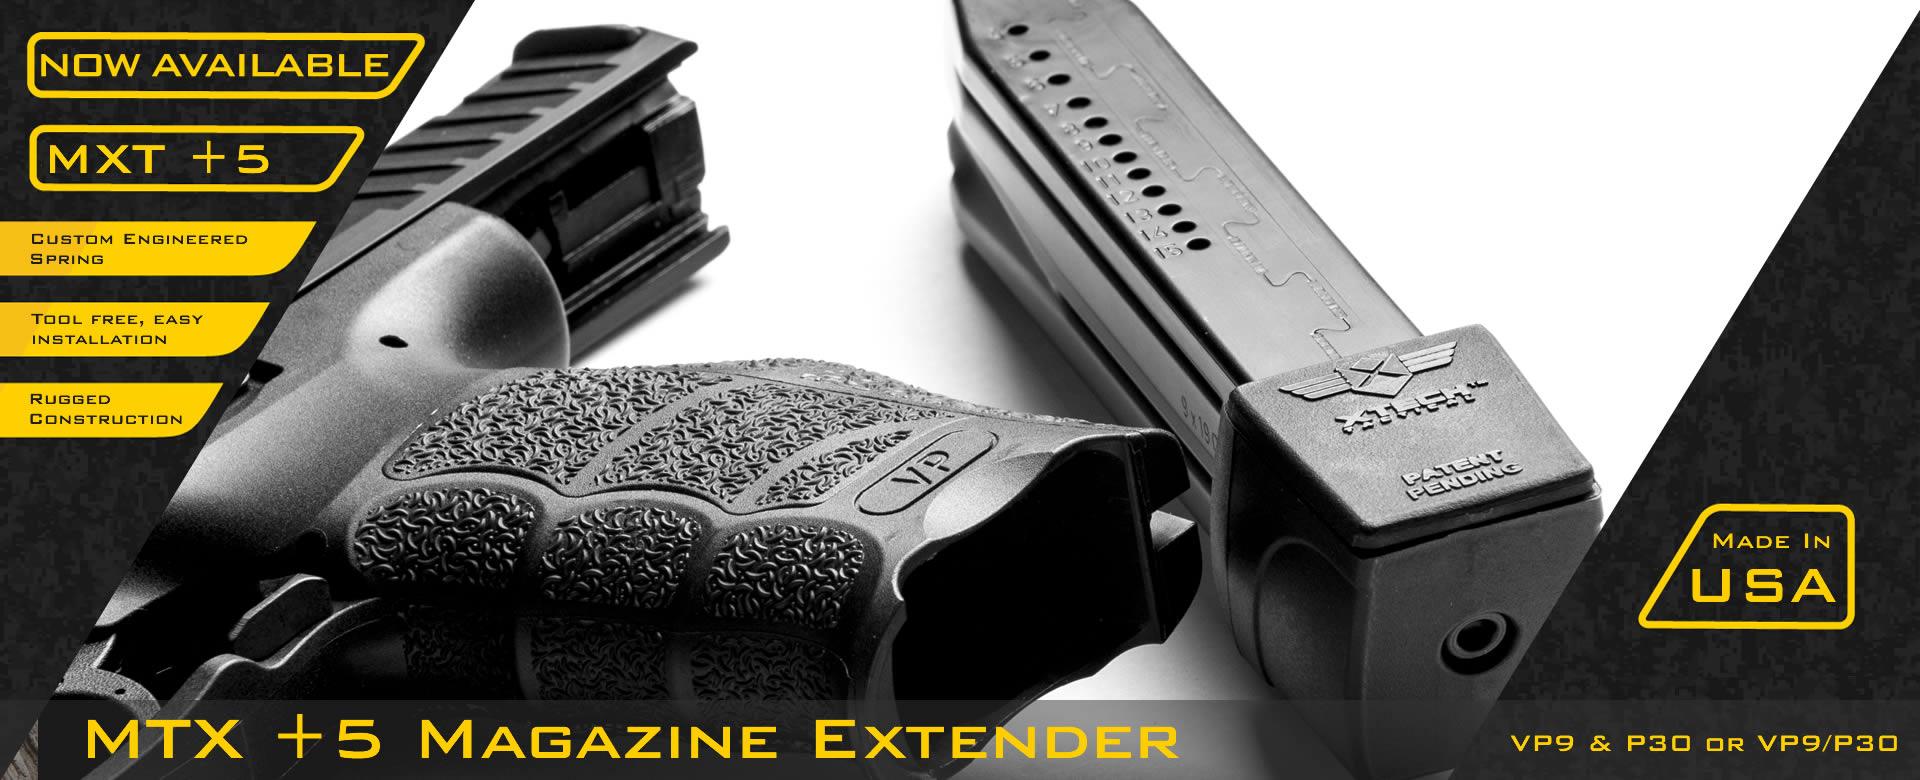 MXT +5 Magazine Extender